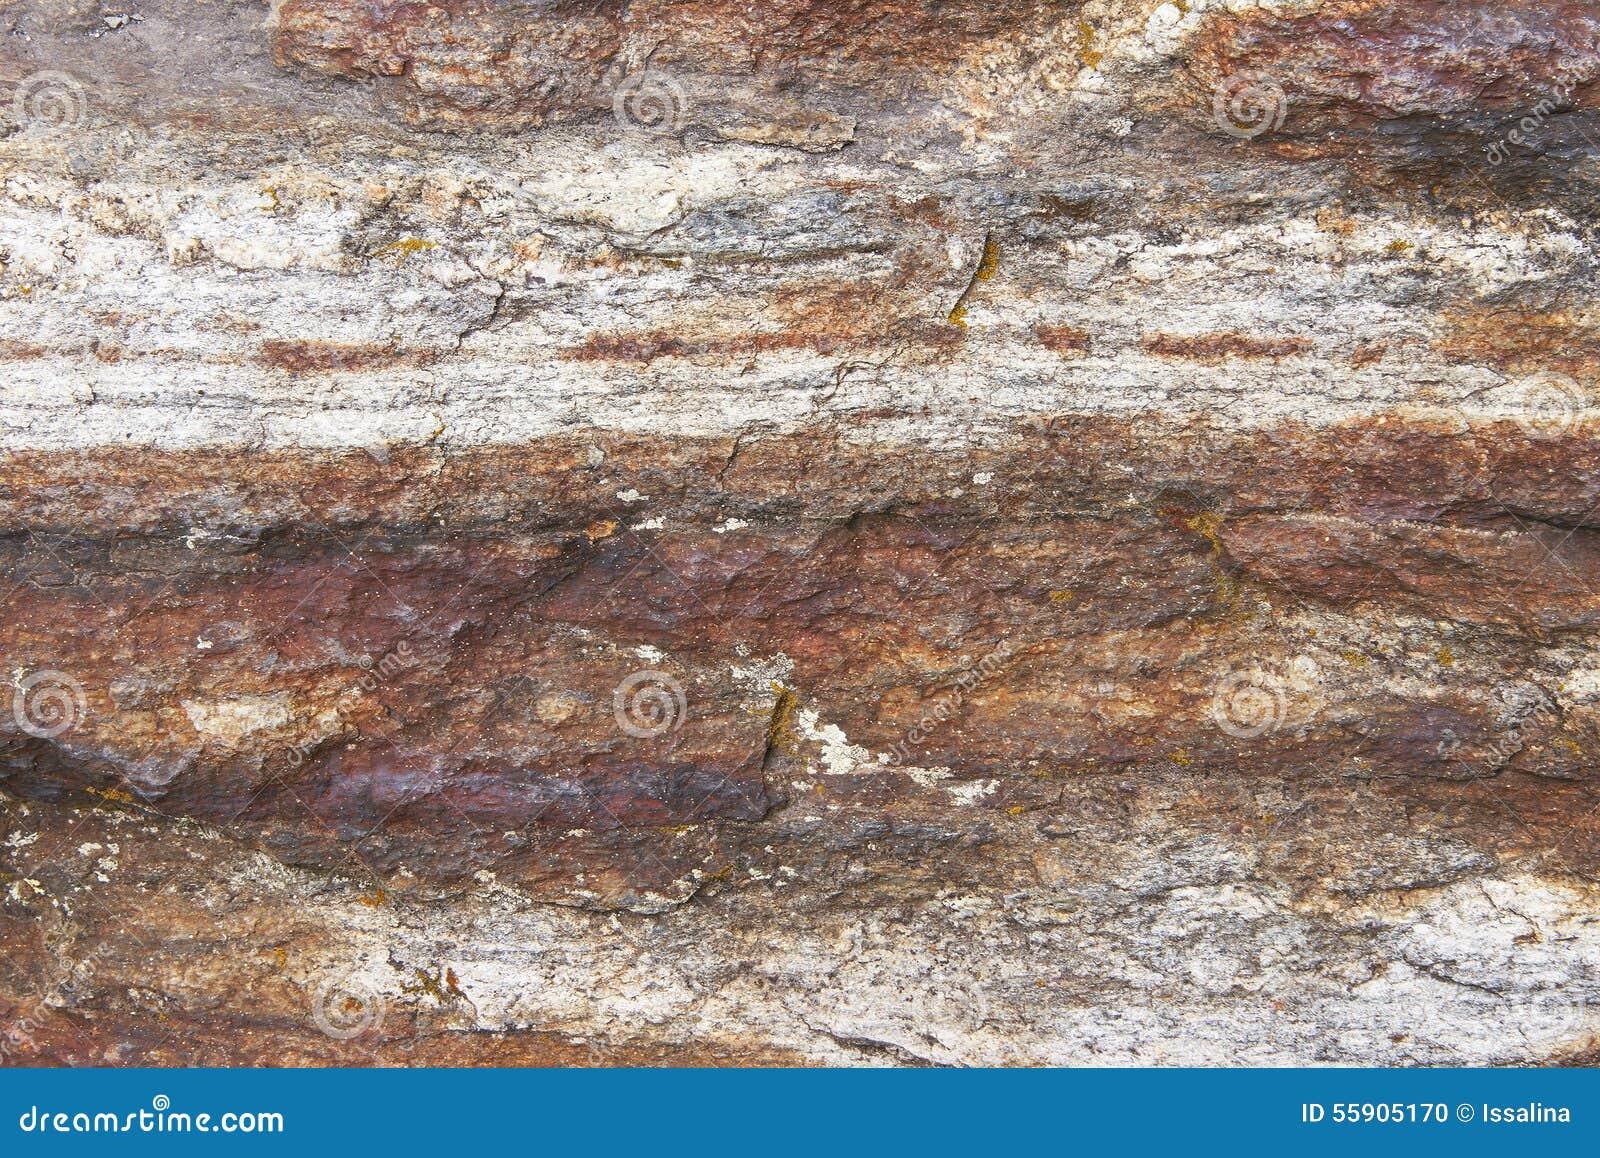 Red Granite Rock : Red granite rock background stock photo image